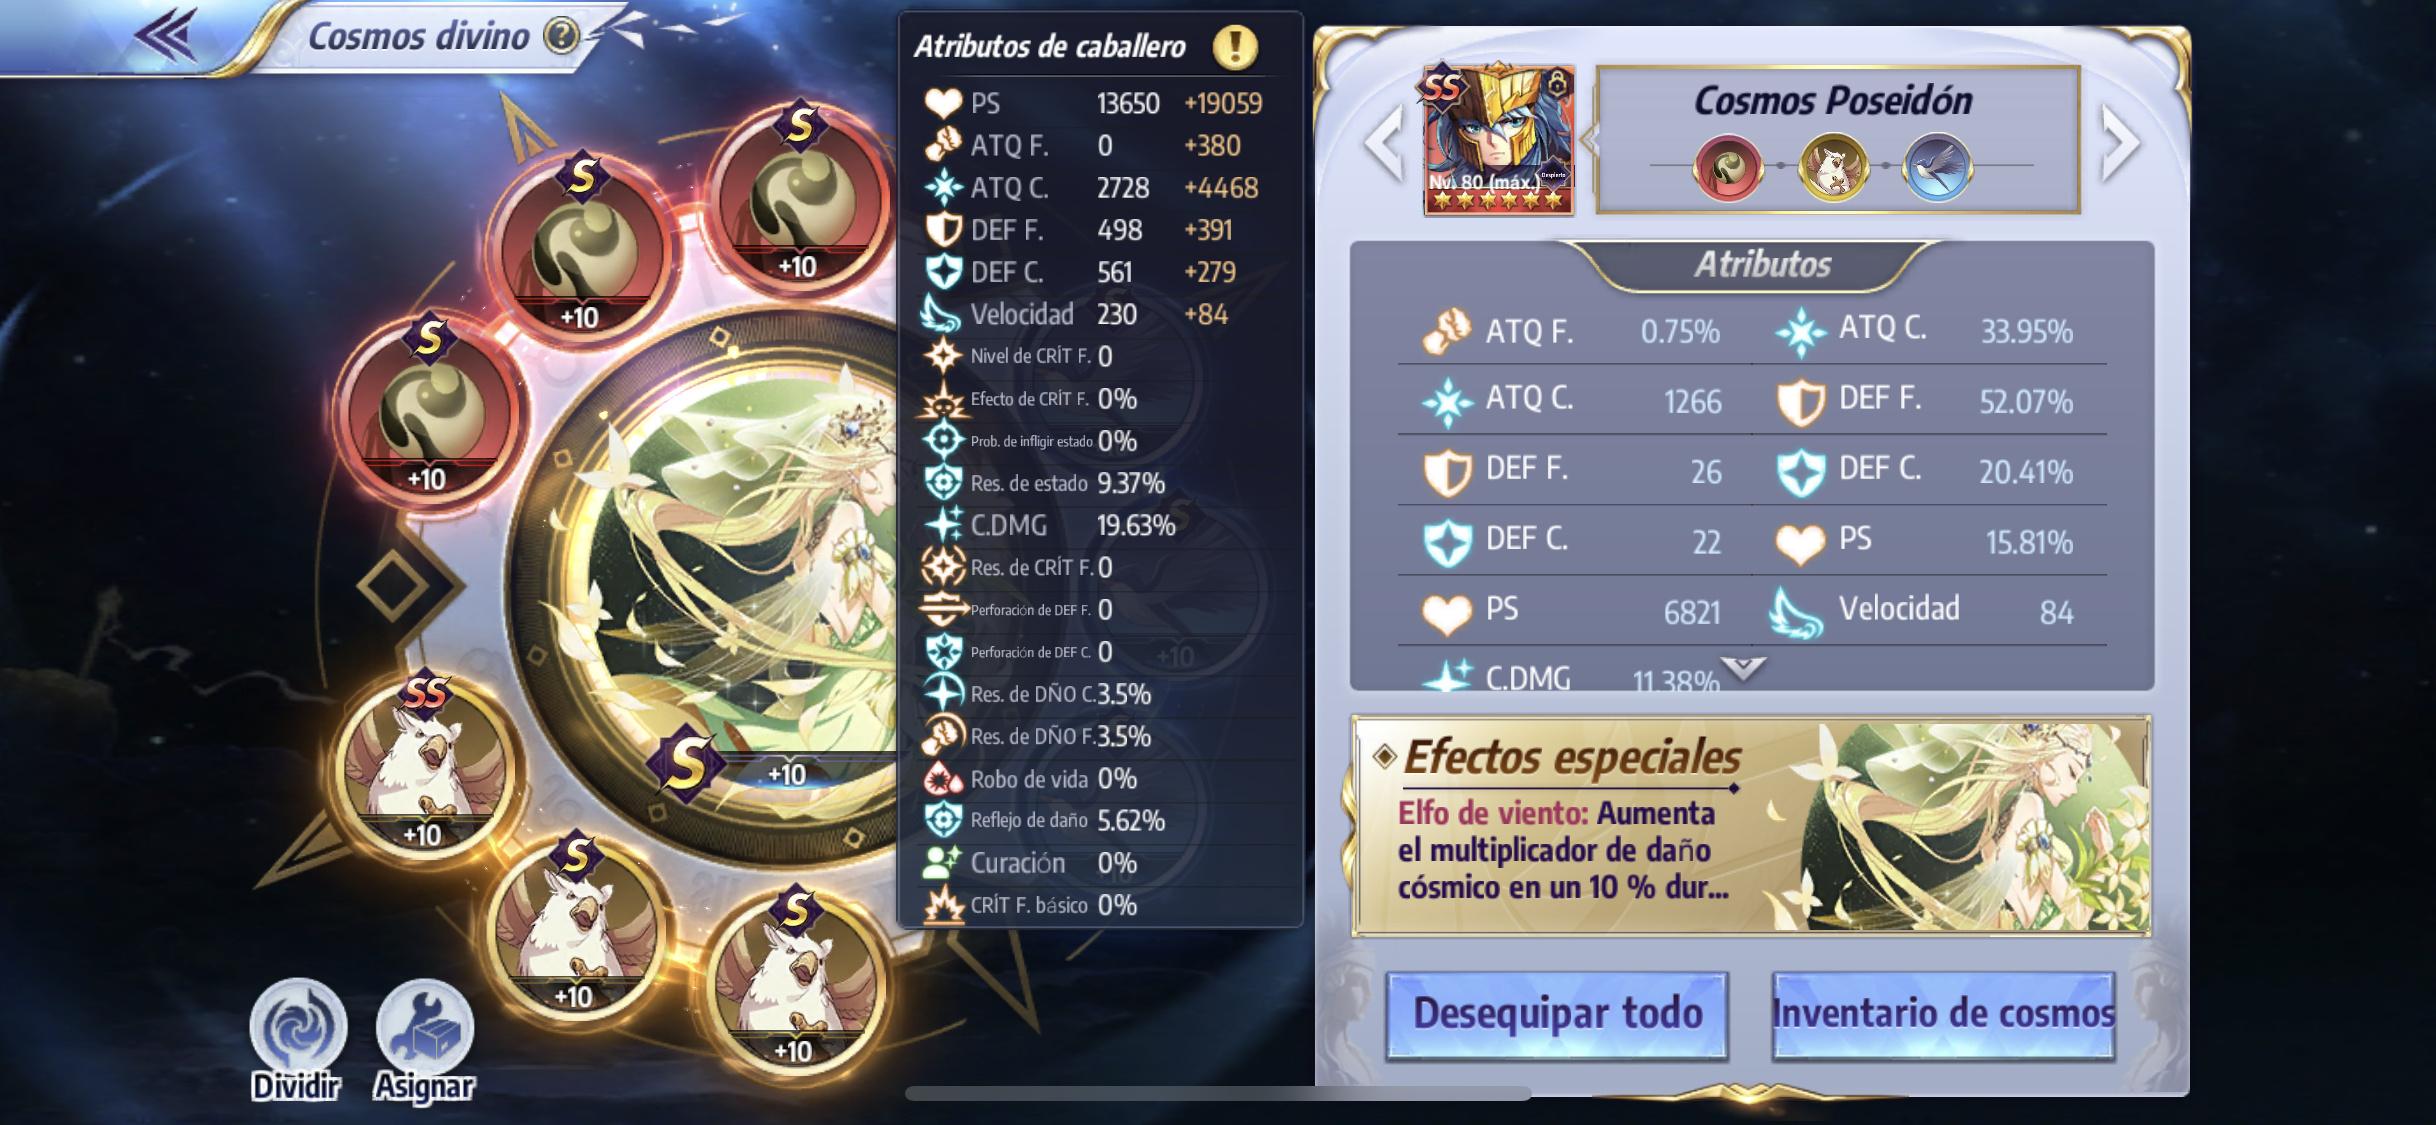 Saint Seiya Awakening Knights Of The Zodiac Rpg Por Turnos Hecho Con Cariño Gamer Gamerchile Comunidad De Videojuegos Y Mas